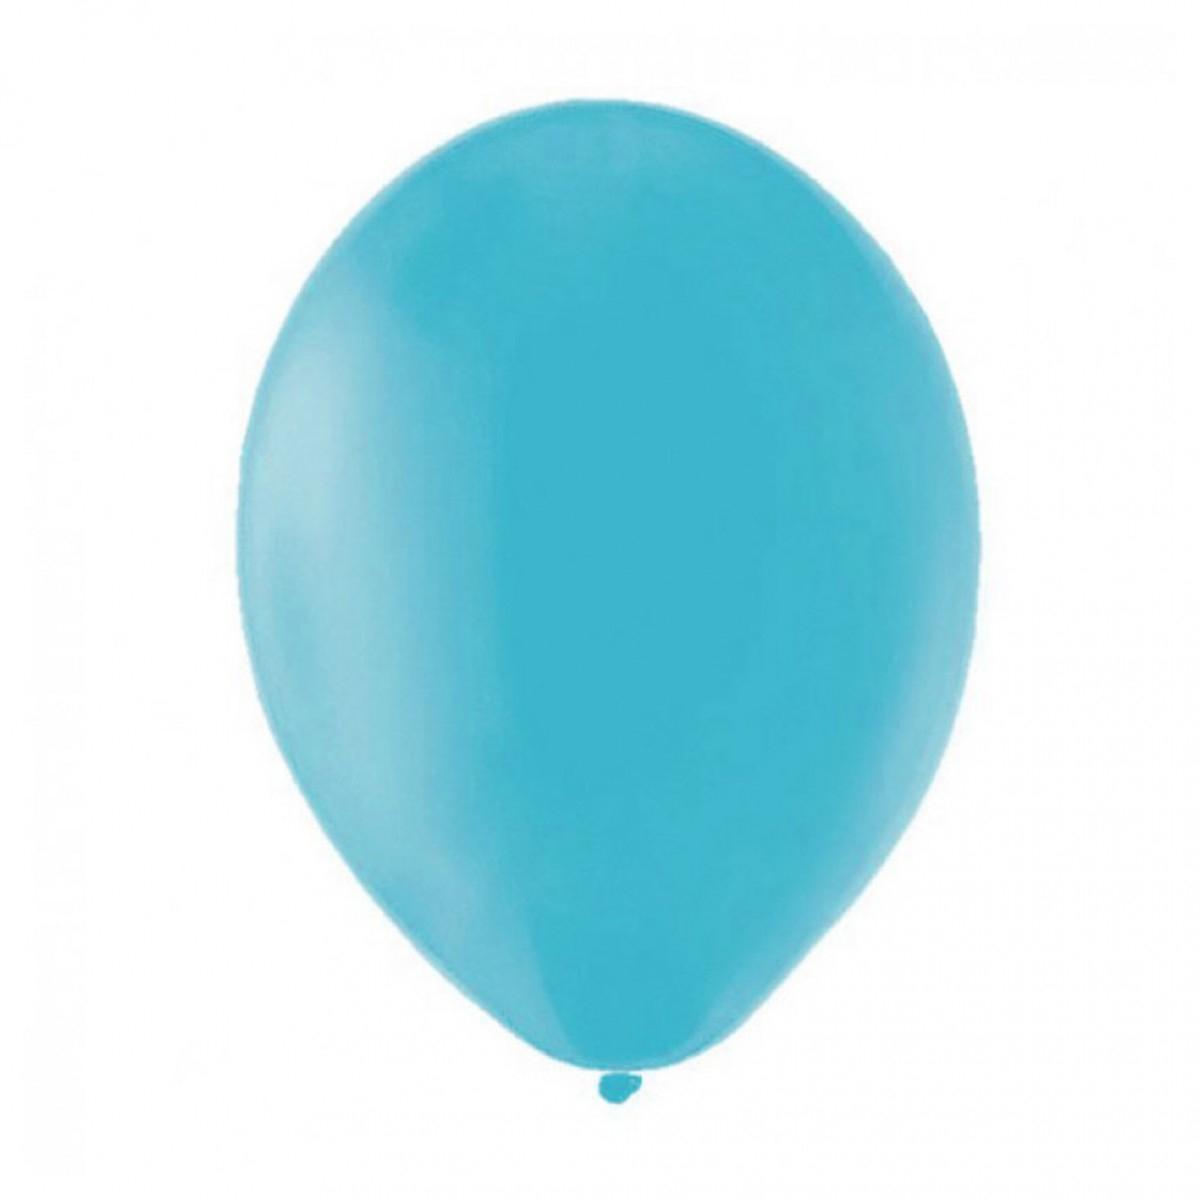 Ballon Baudruche tout Dessin Ballon Baudruche